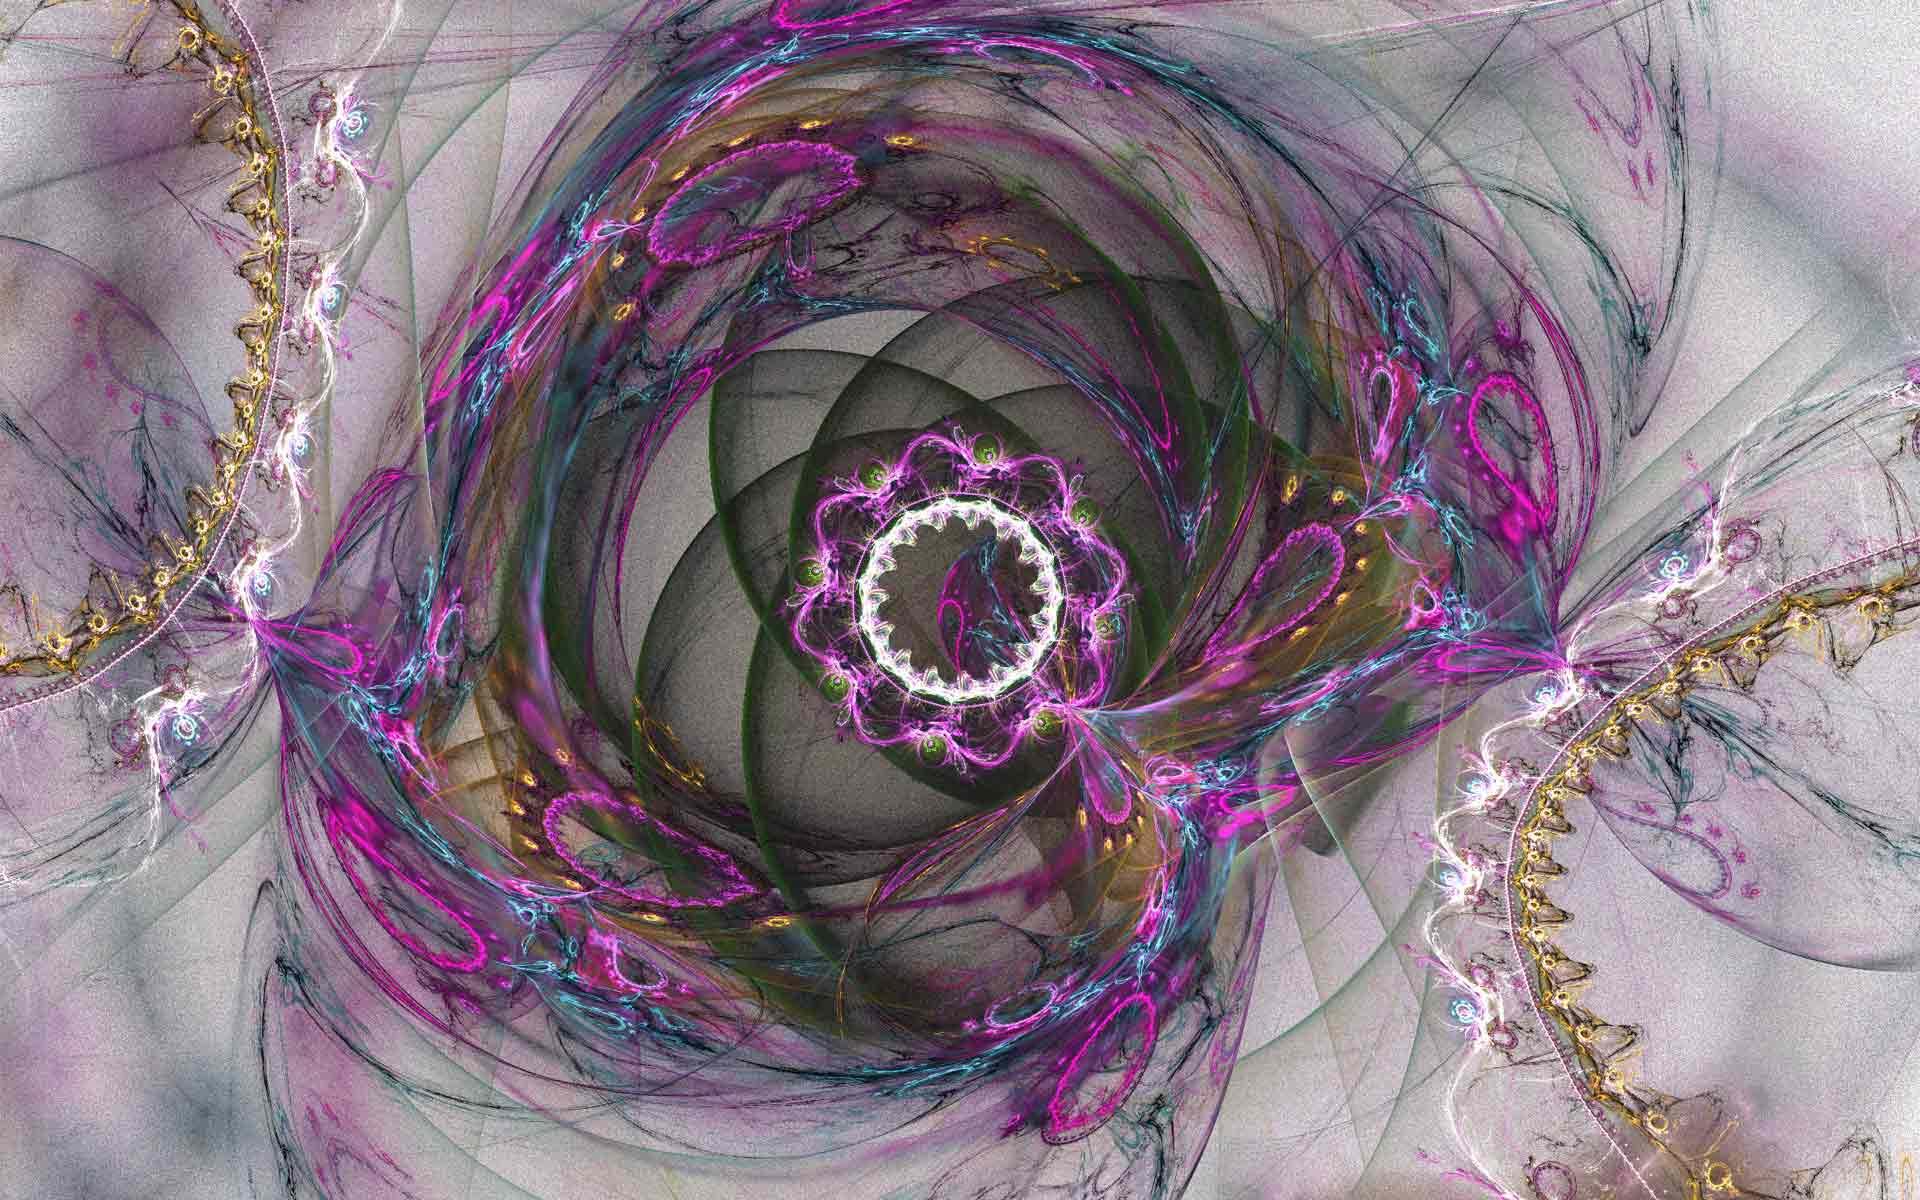 Обои Параллельный мир, картинки - Обои на рабочий стол ...: http://www.kartinkioboi.ru/photo/abstract/parallelnyj_mir/2-0-1481